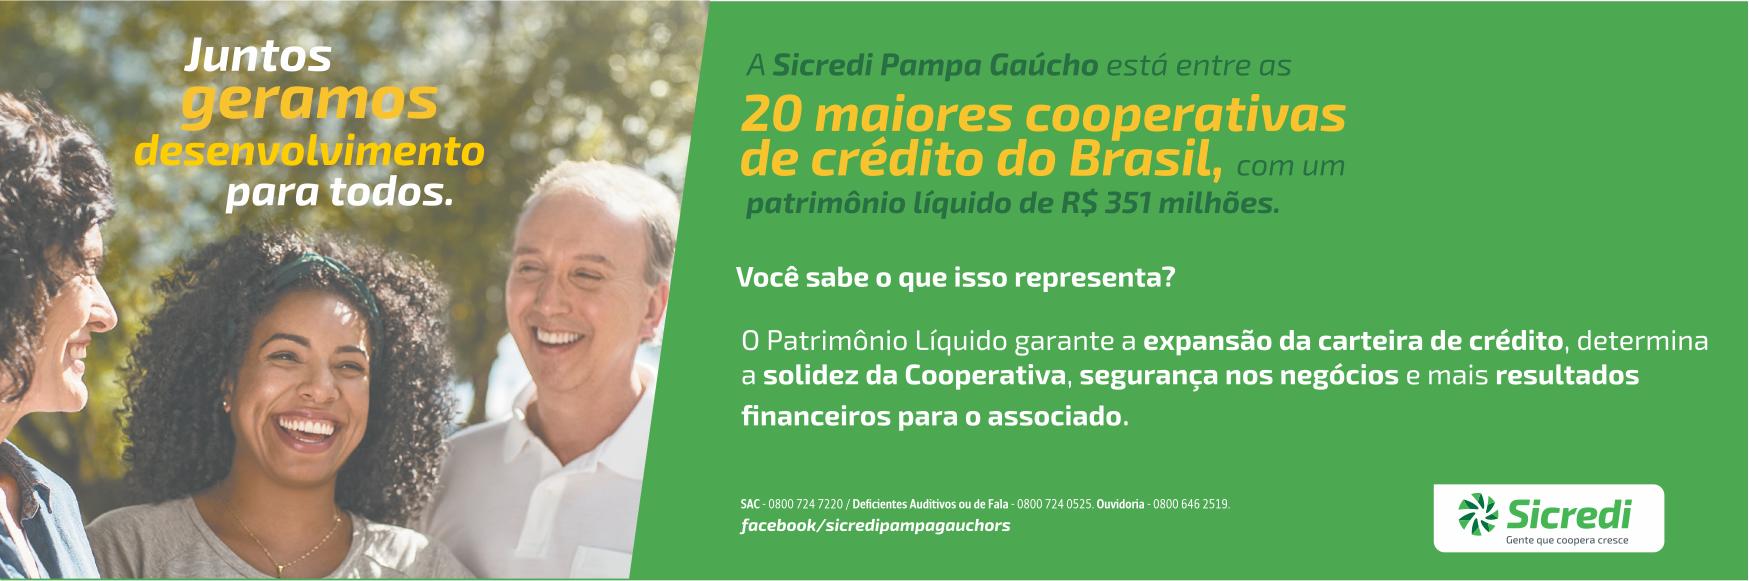 Sicredi Pampa Gaúcho - Juntos geramos desenvolvimento para todos